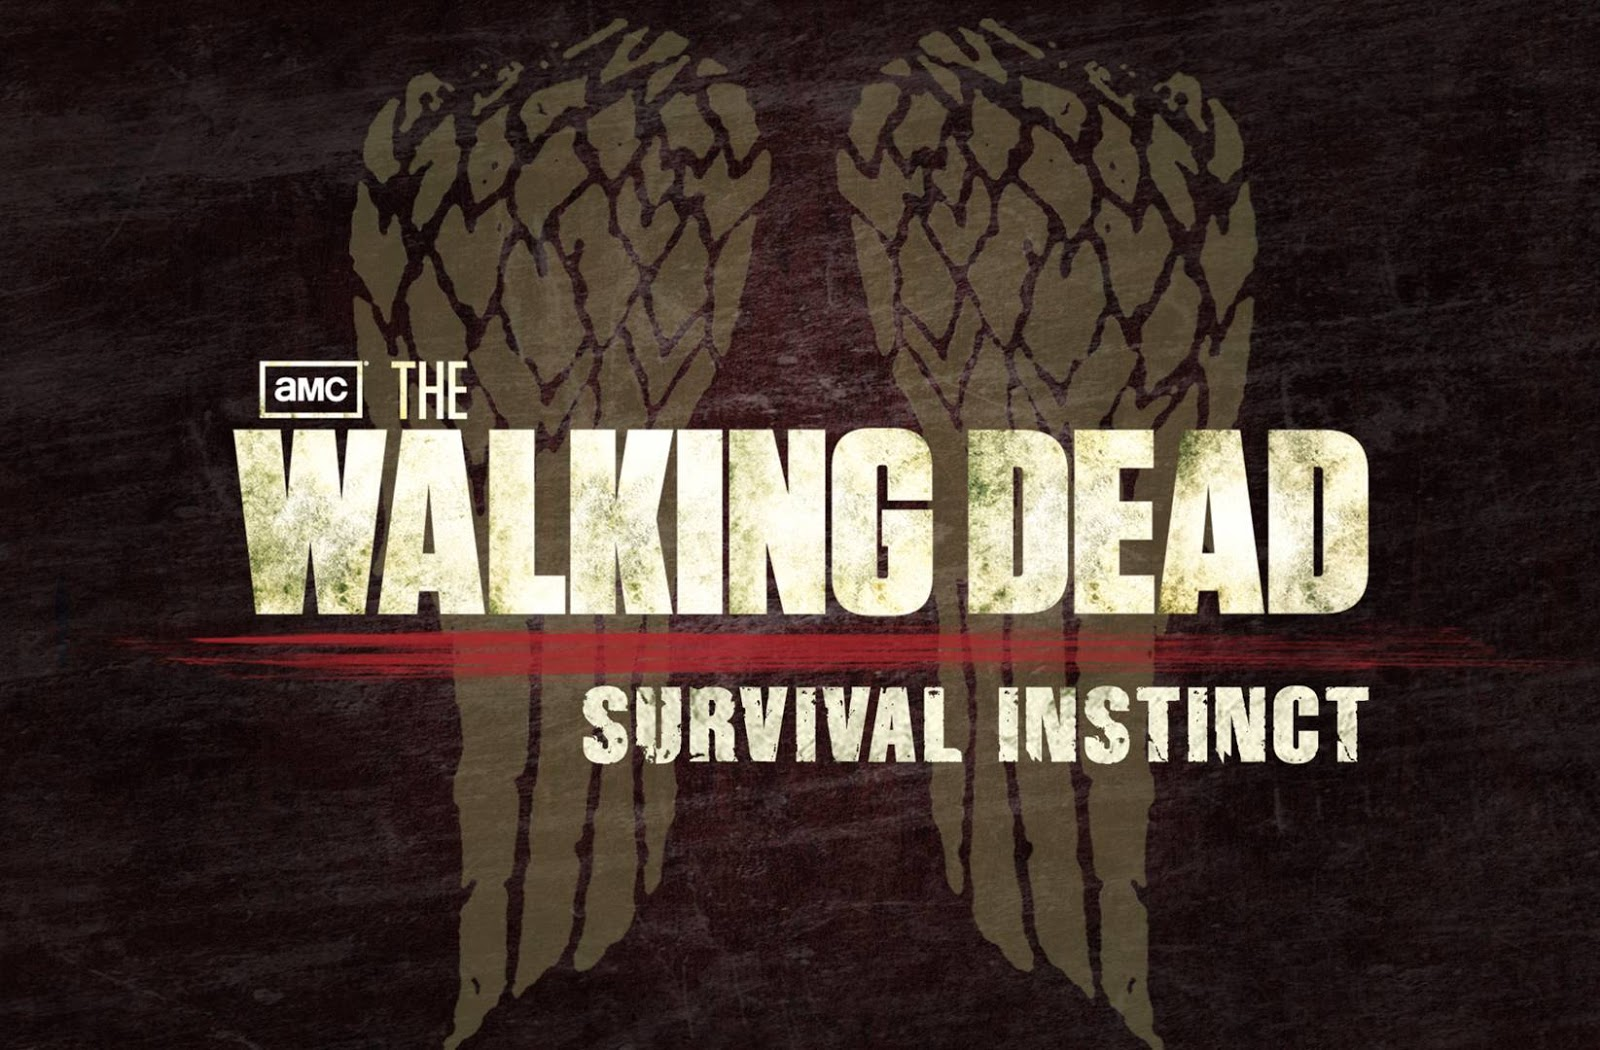 The Walking Dead Logo 2014 Fondo De Pantalla Fondos De: Wallpapers HD: 38 Wallpapers De La Serie The Walking Dead